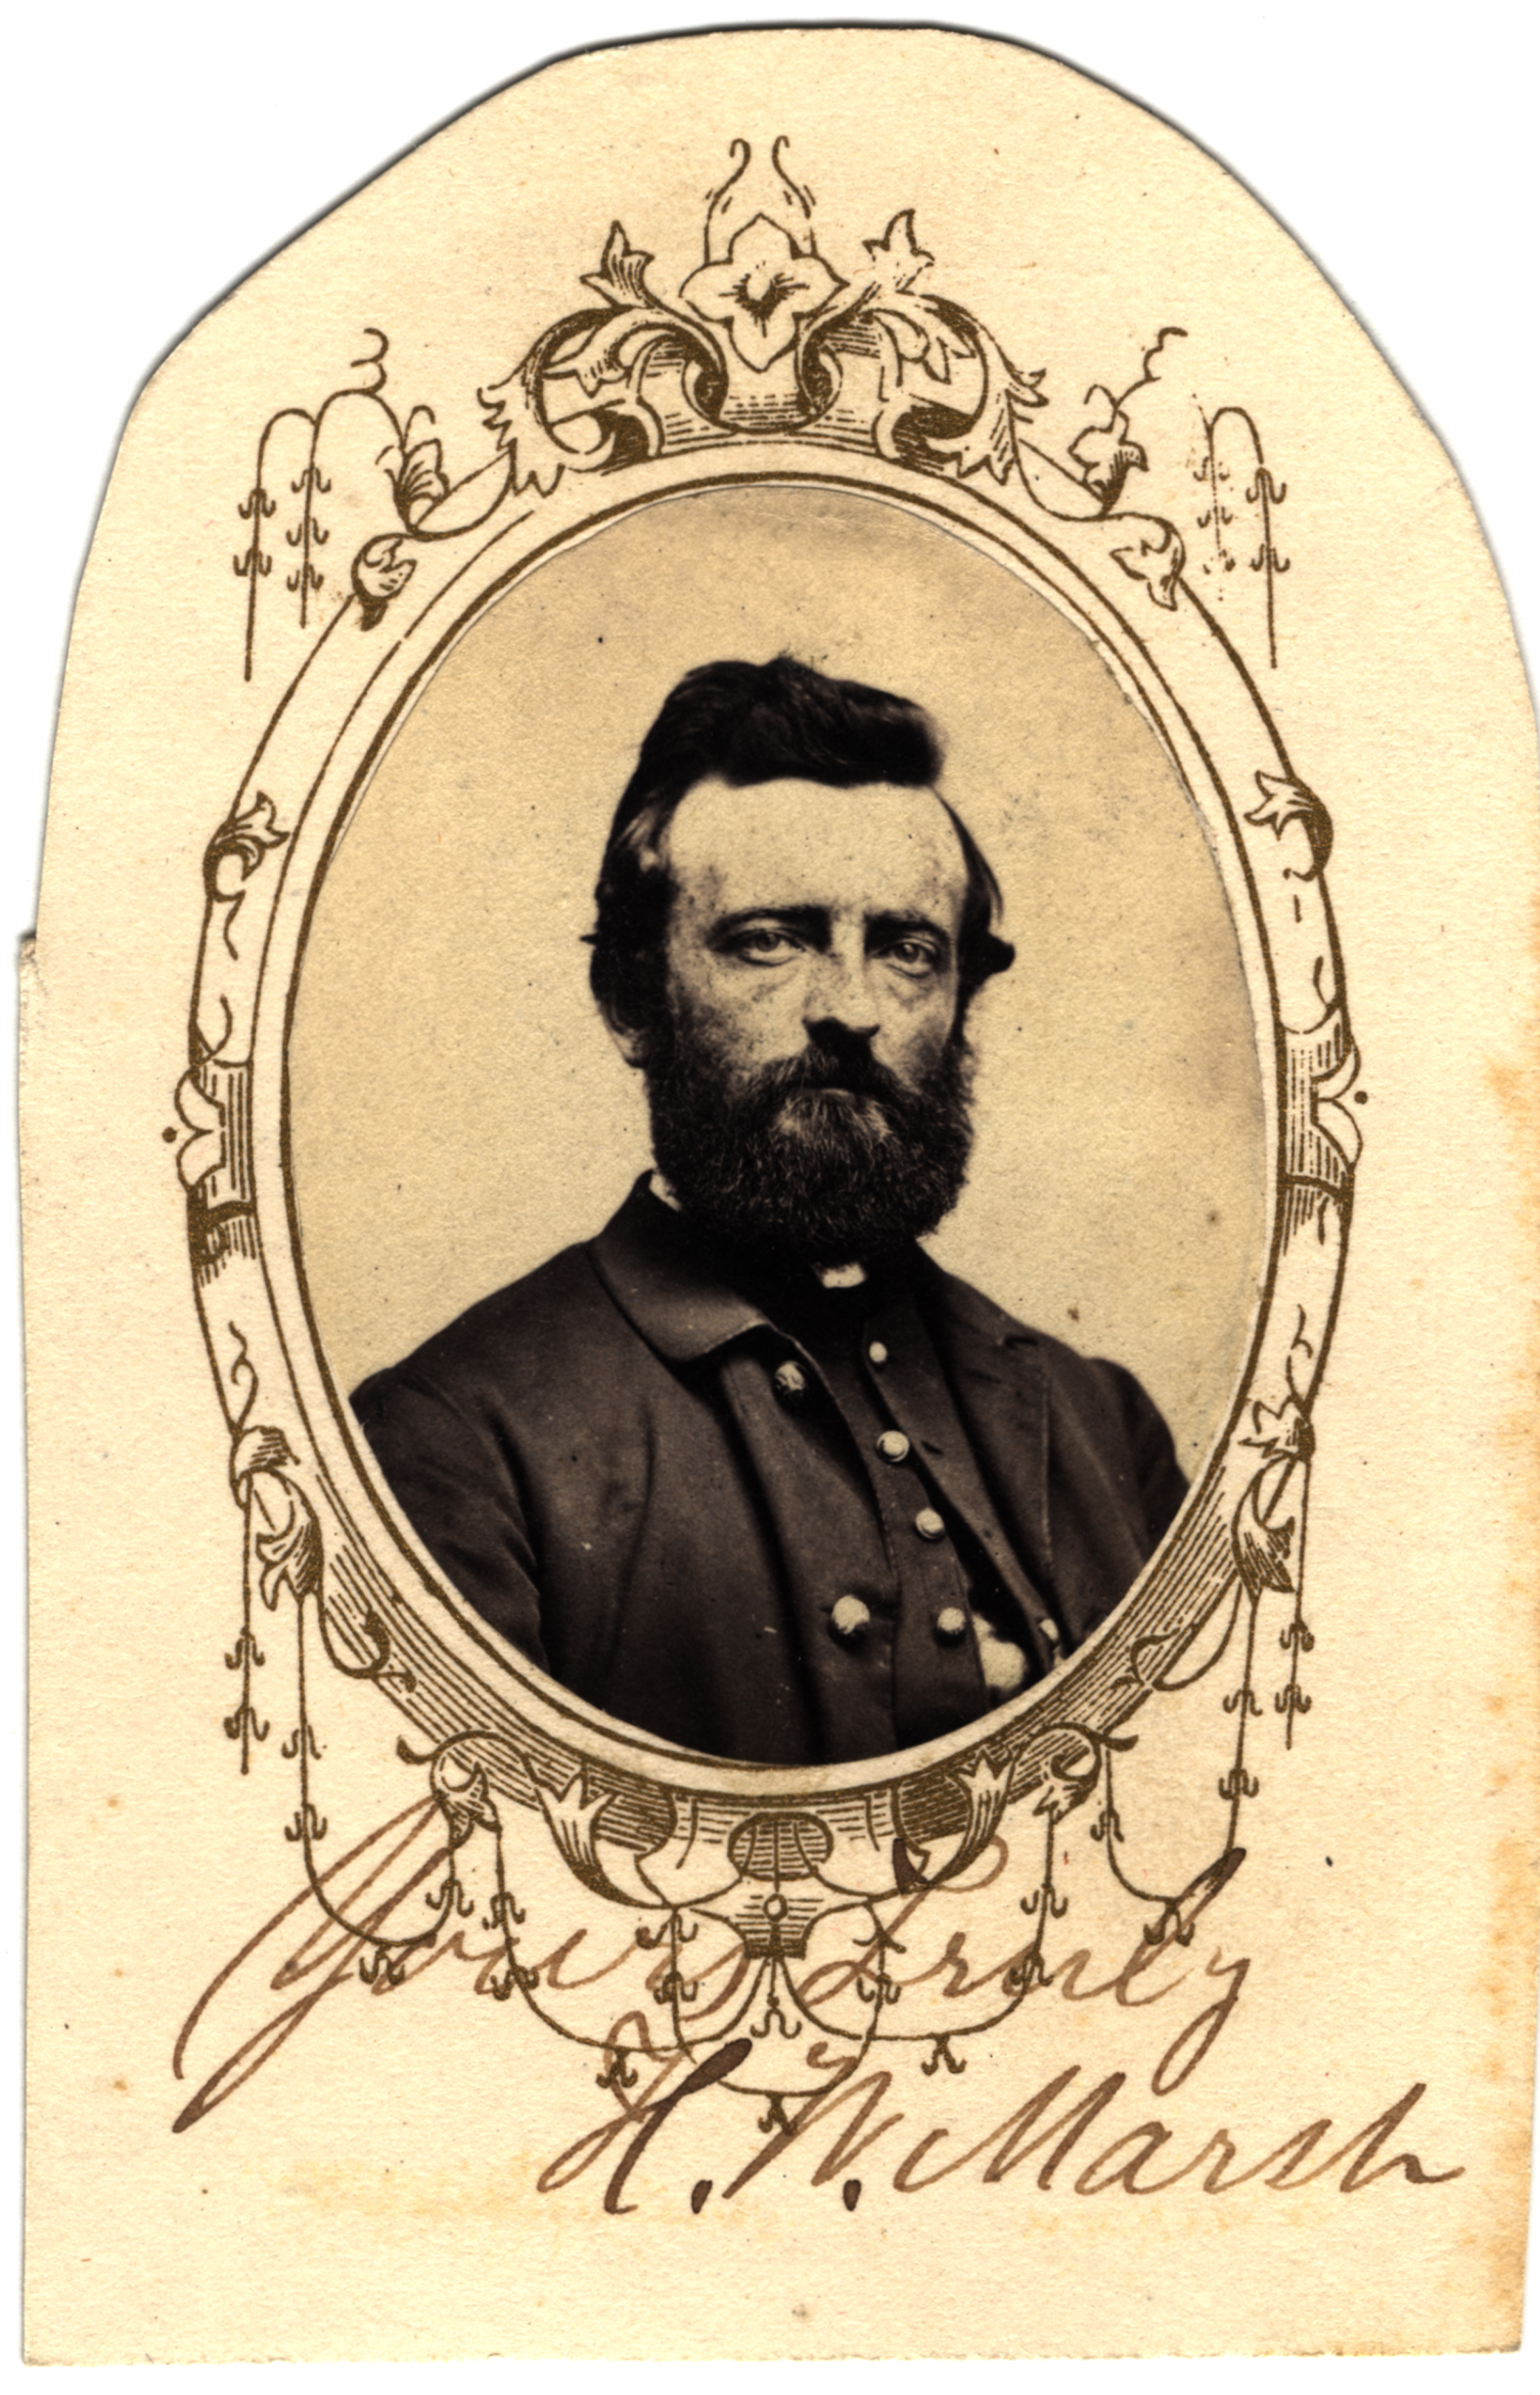 H. W. Marsh, circa 1860s